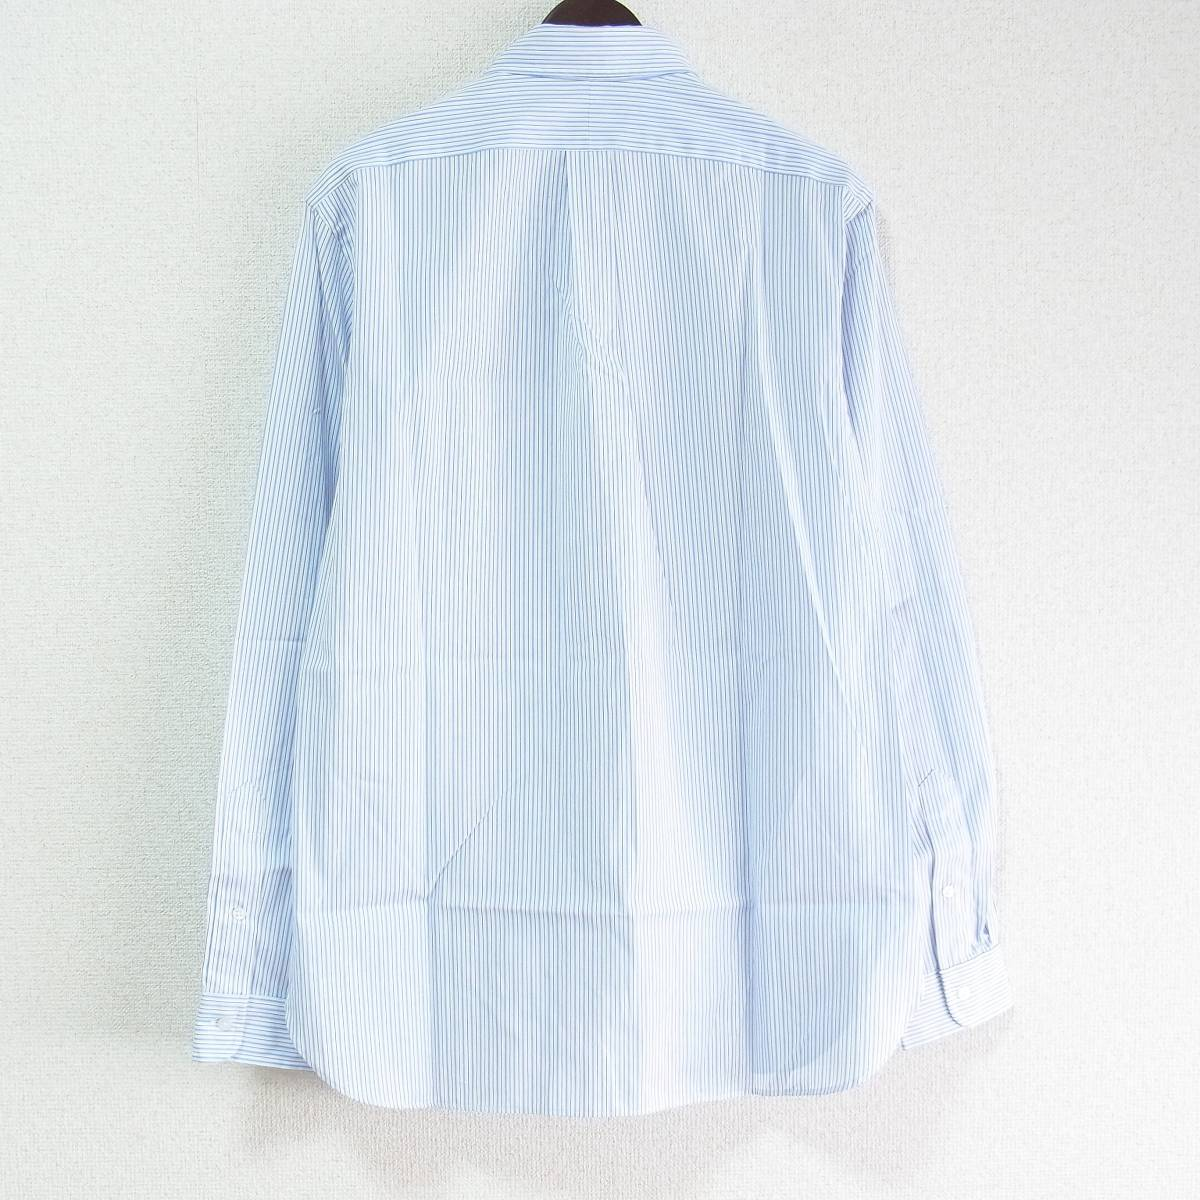 RALPH LAUREN ラルフローレン 長袖 ストライプ ボタンダウンシャツ 15-1/2(39) ライトブルー/ネイビー_画像2